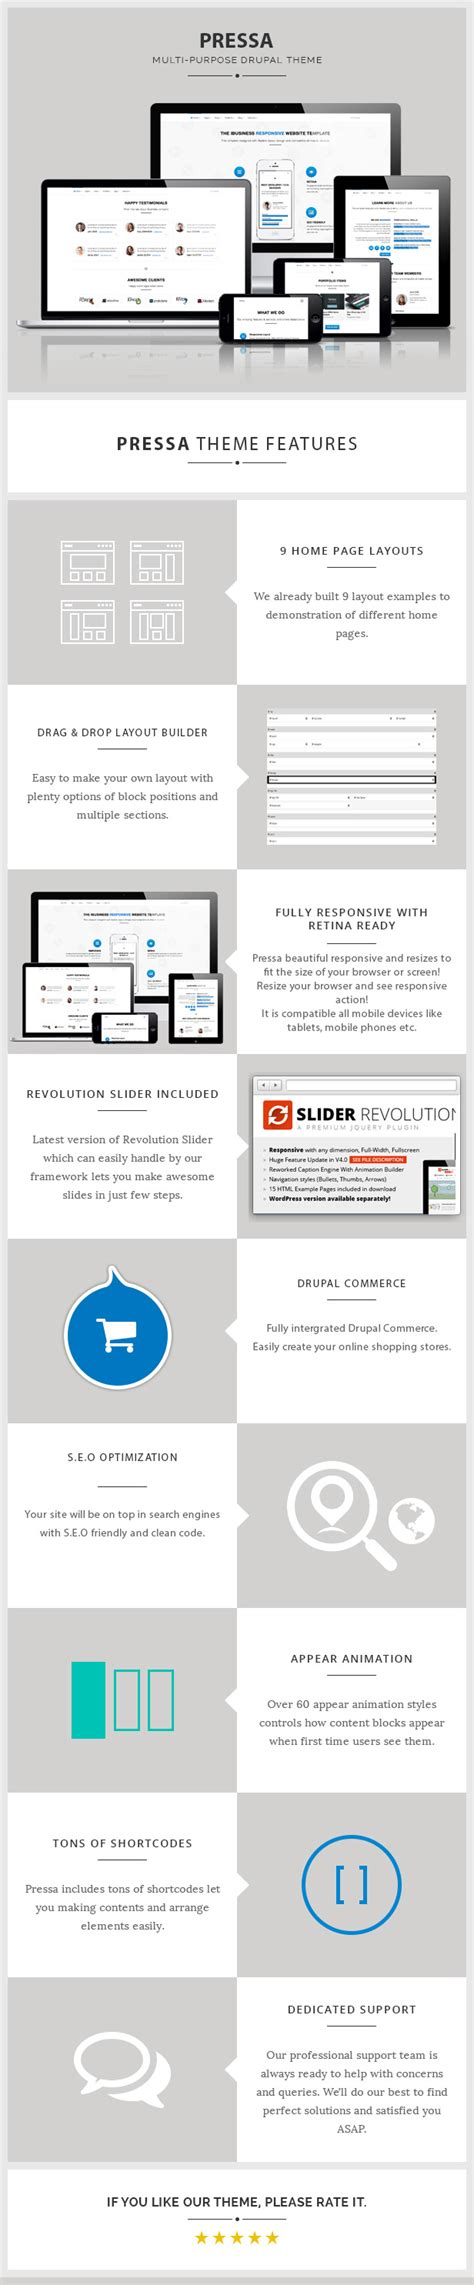 drupal themes overview pressa multi purpose ecommerce drupal theme